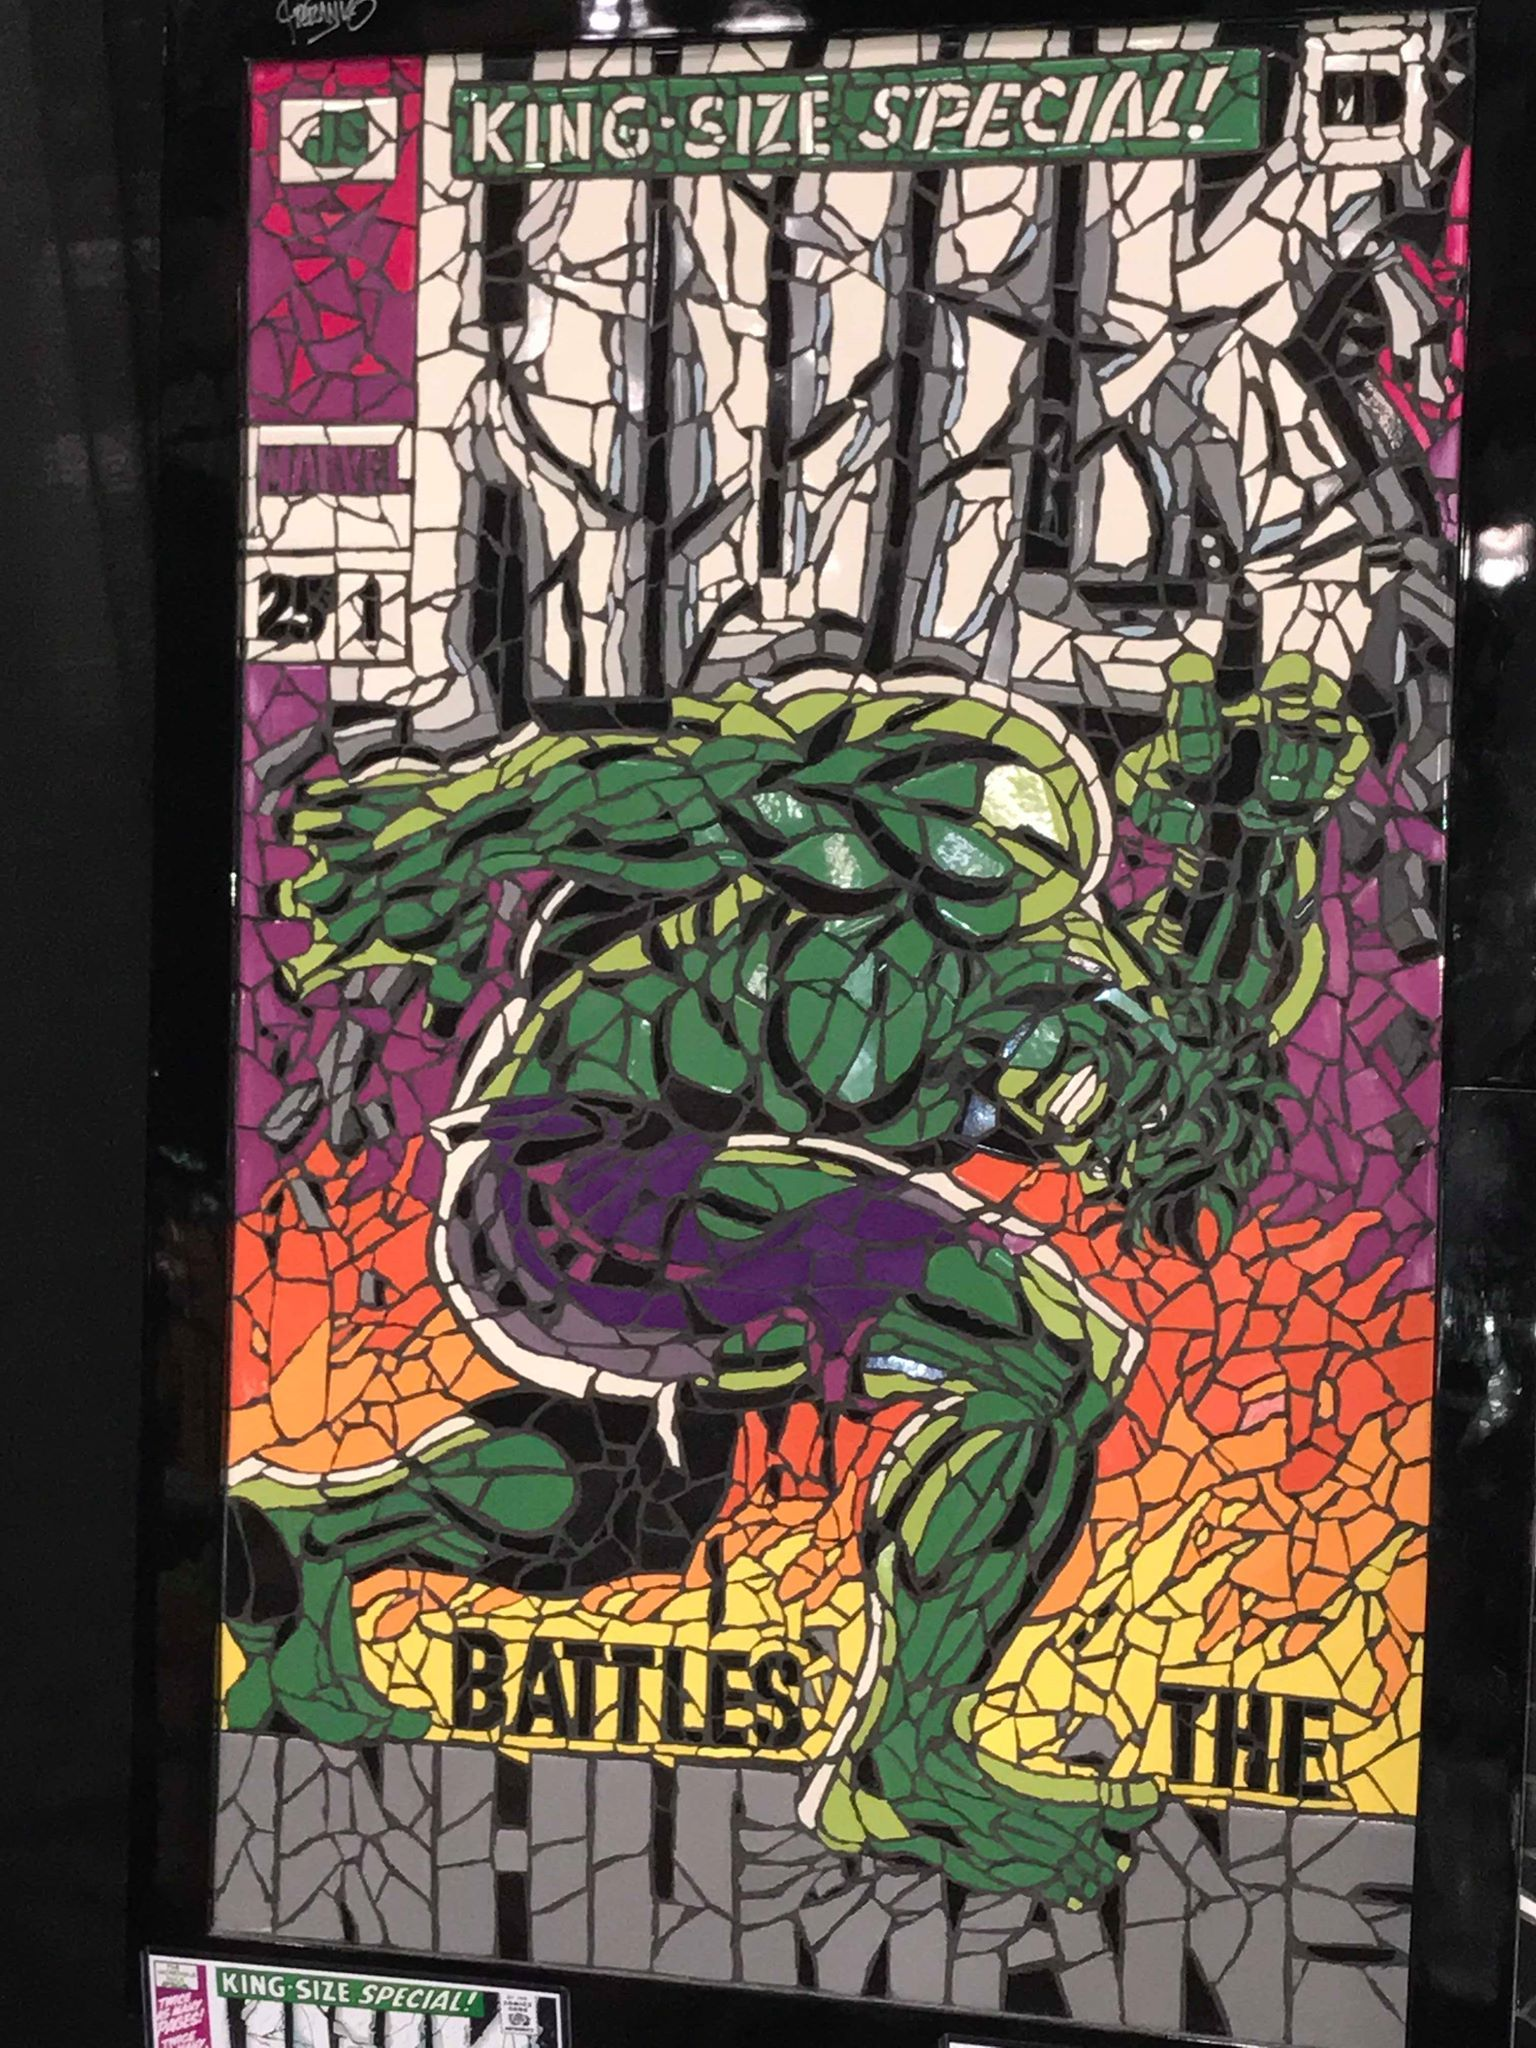 Immortal Hulk #20 Lucio Parrillo Trade Dress Variant,Very Limited.